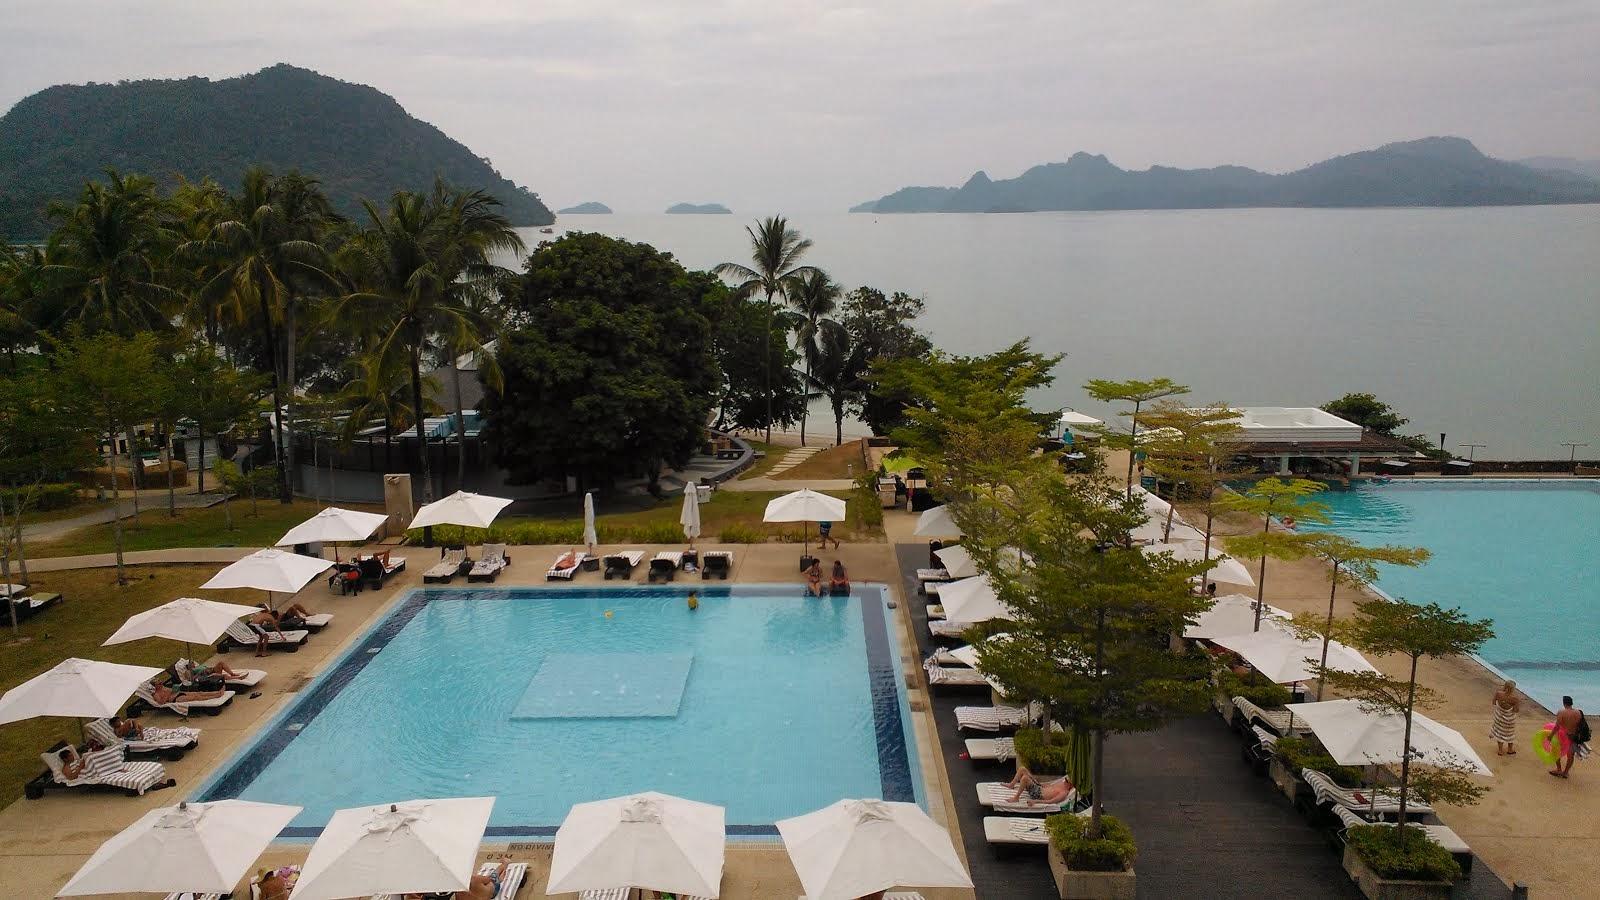 Westin Hotel - Langkawi - Malaysia